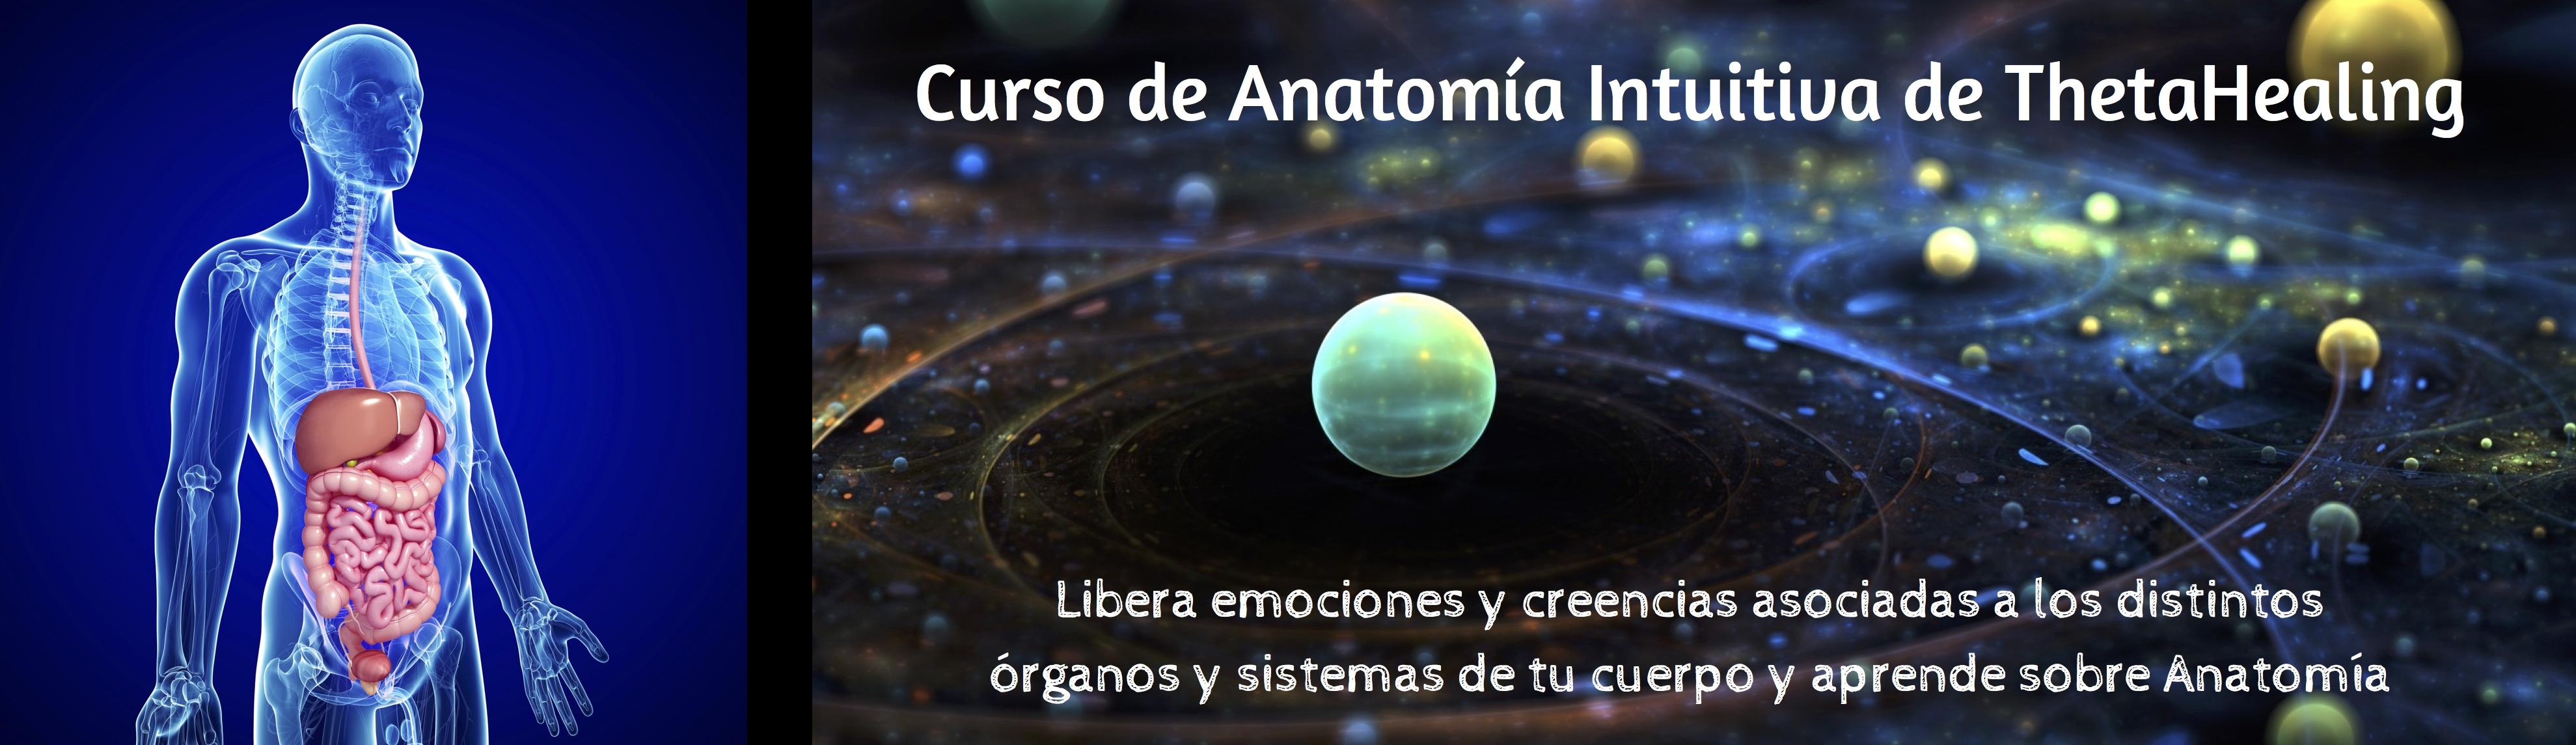 Banner-de-Anatomia-Intuitiva